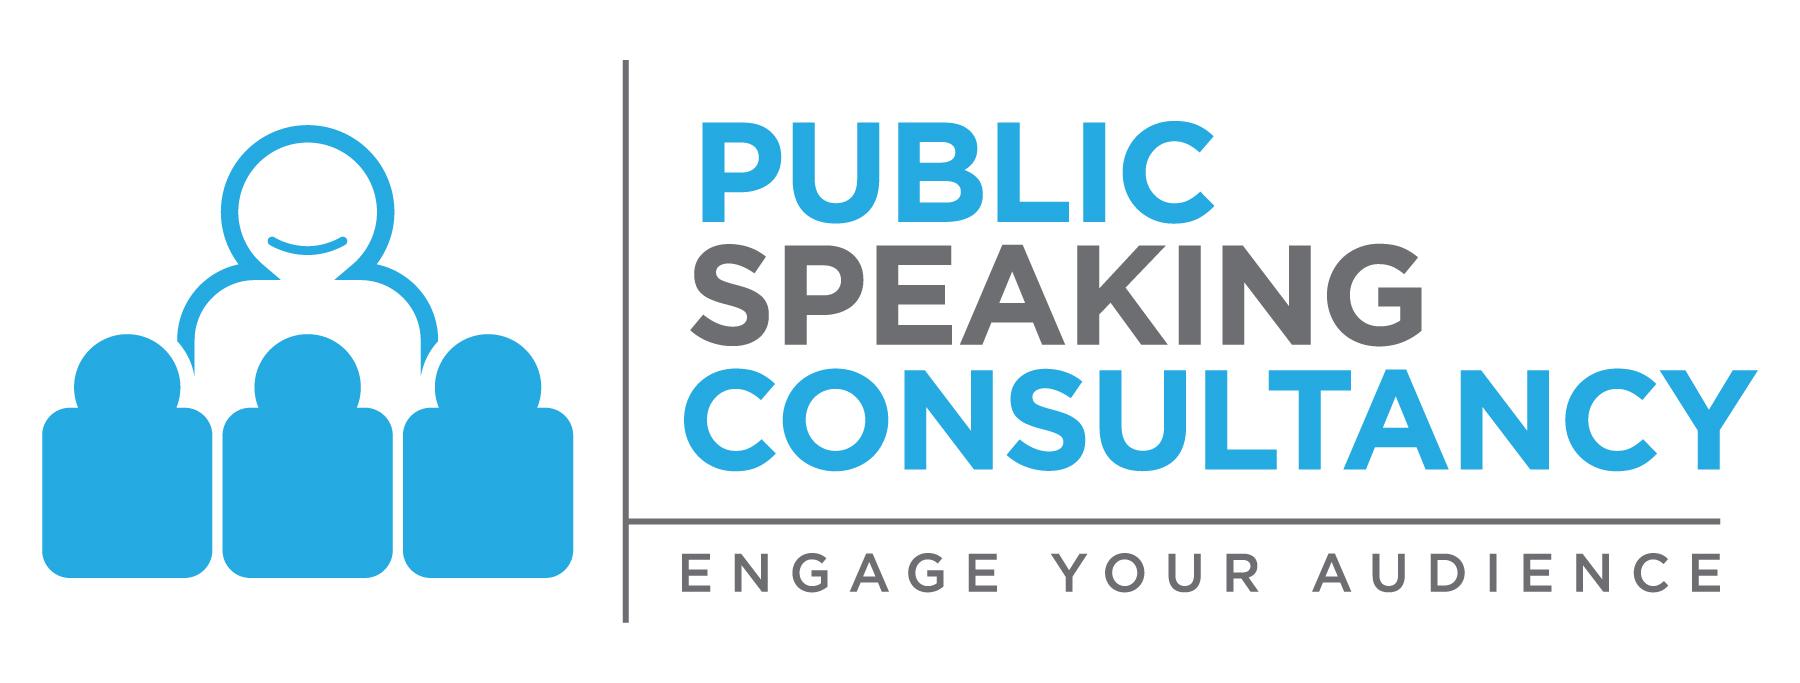 Public Speaking Consultancy_Final_300.jpg